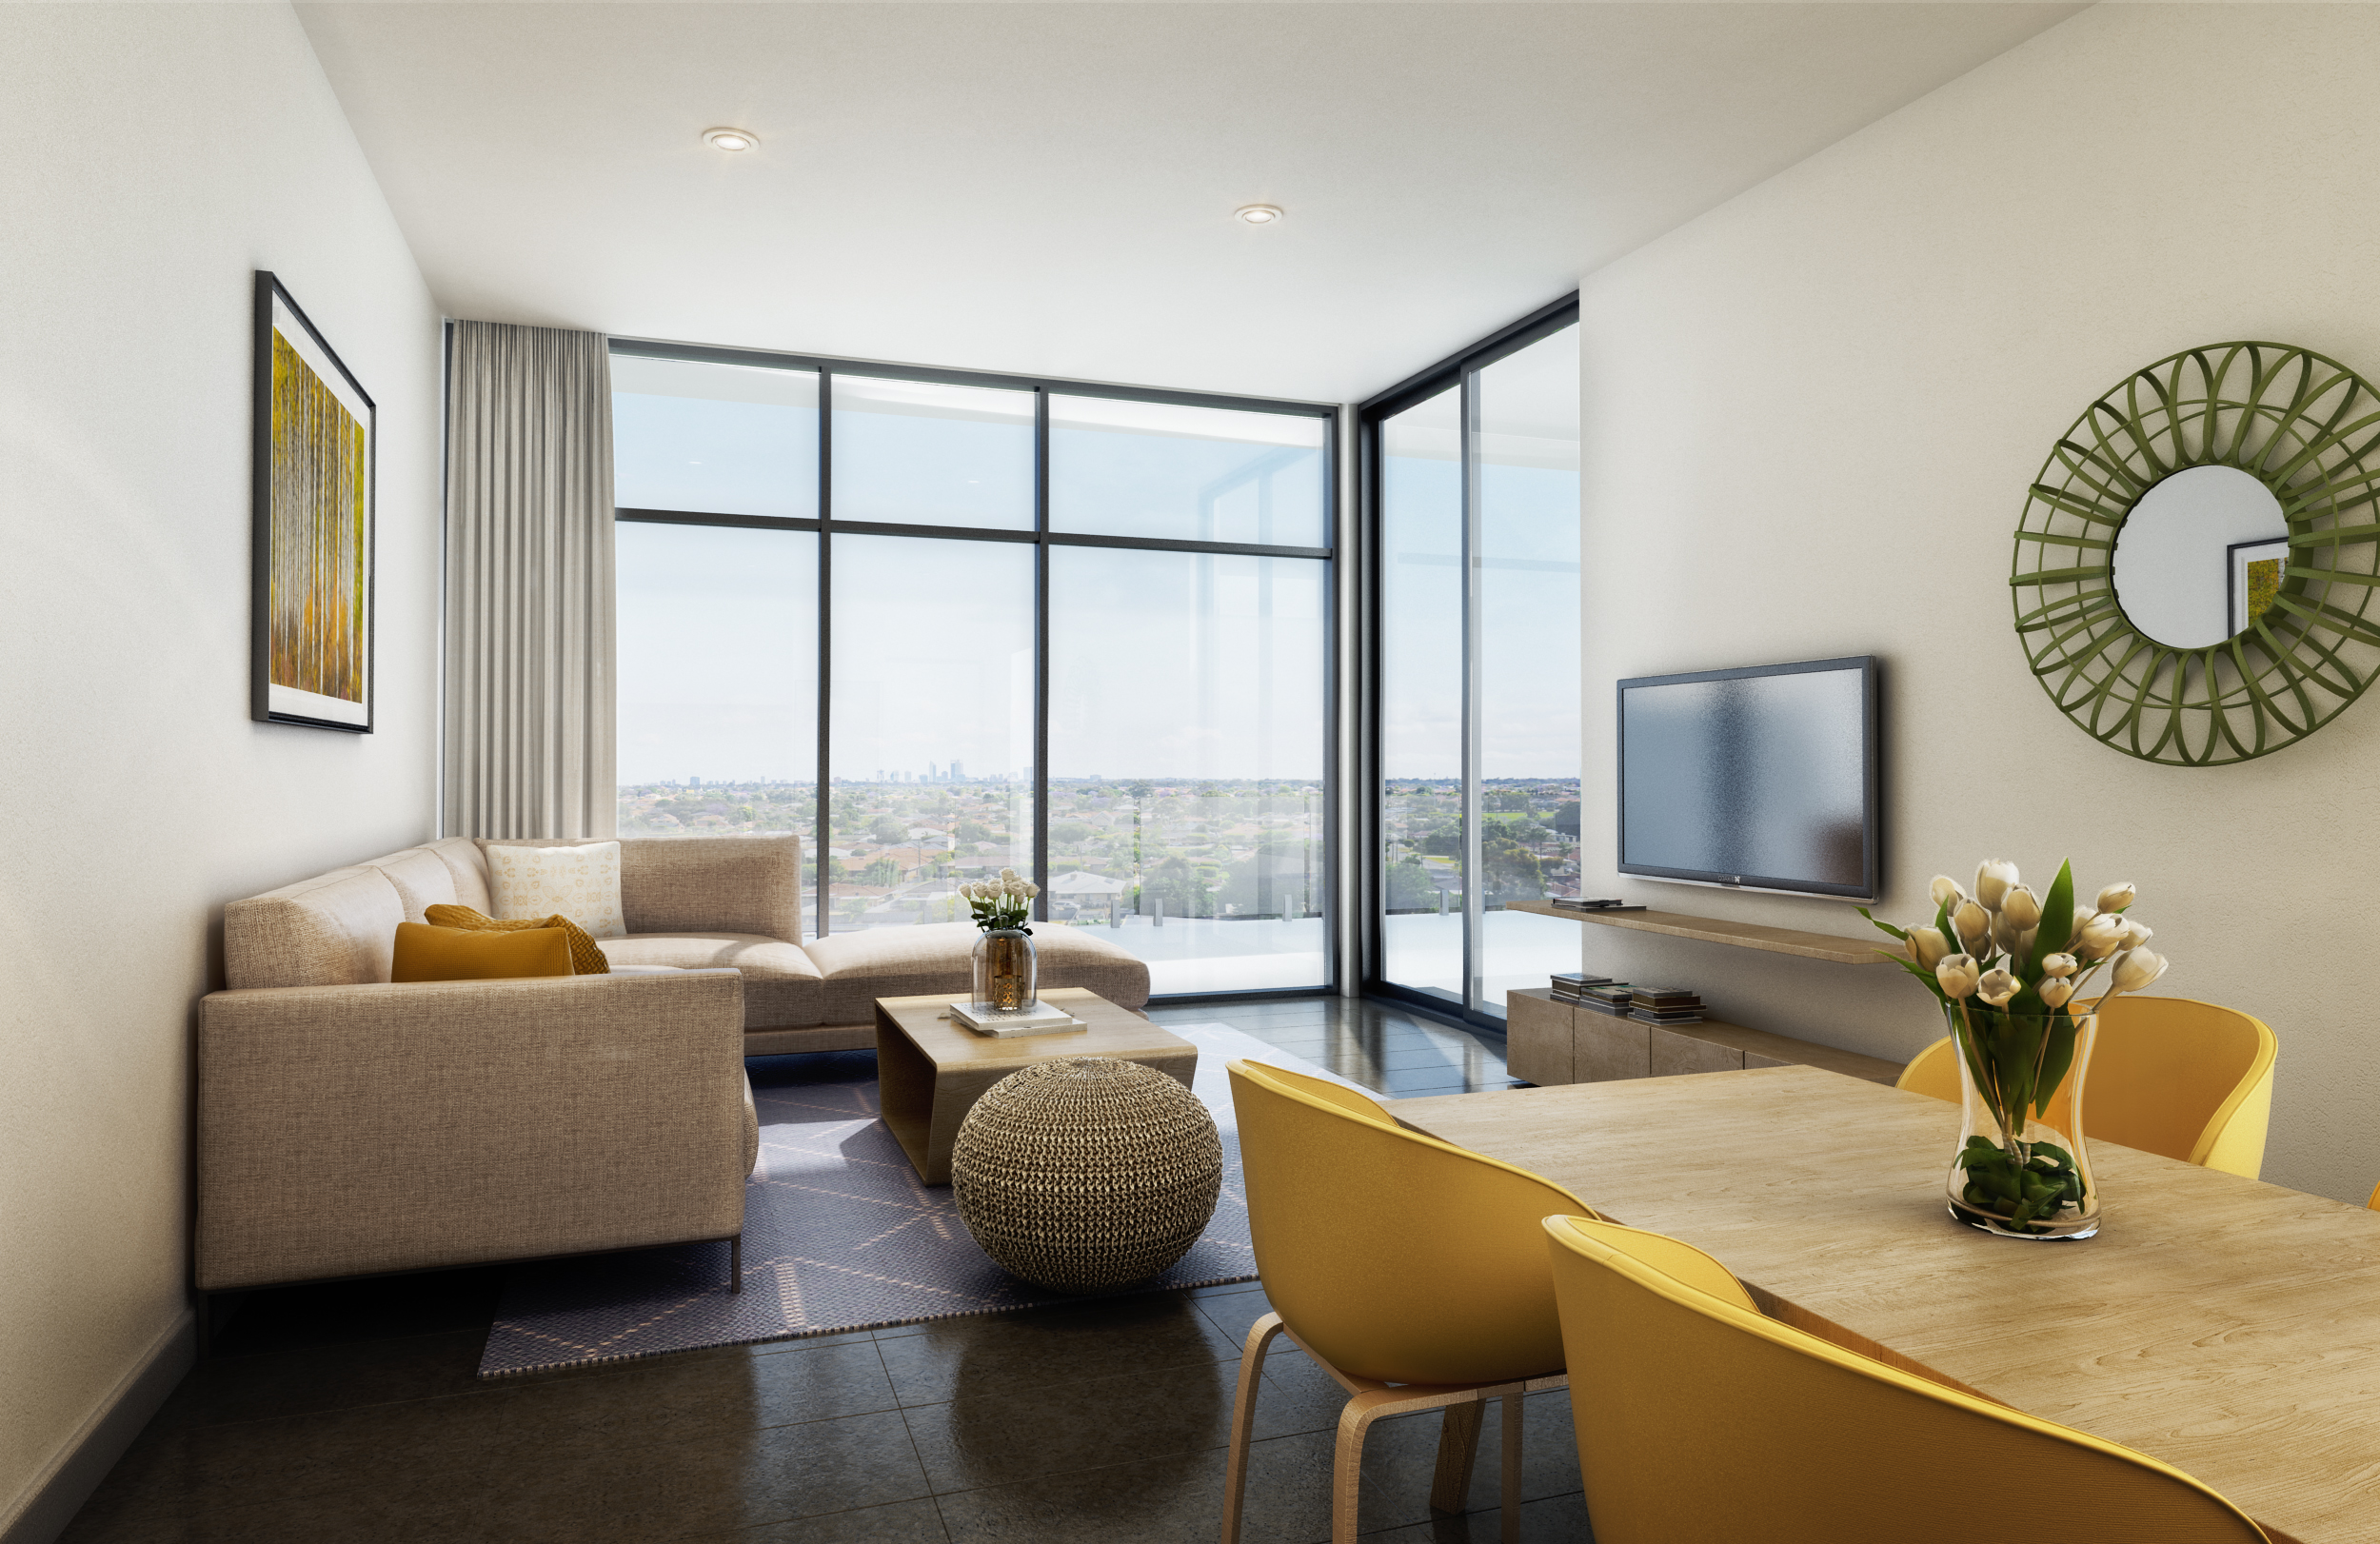 75 interior design management group dwayne clark - Interior design verona ...